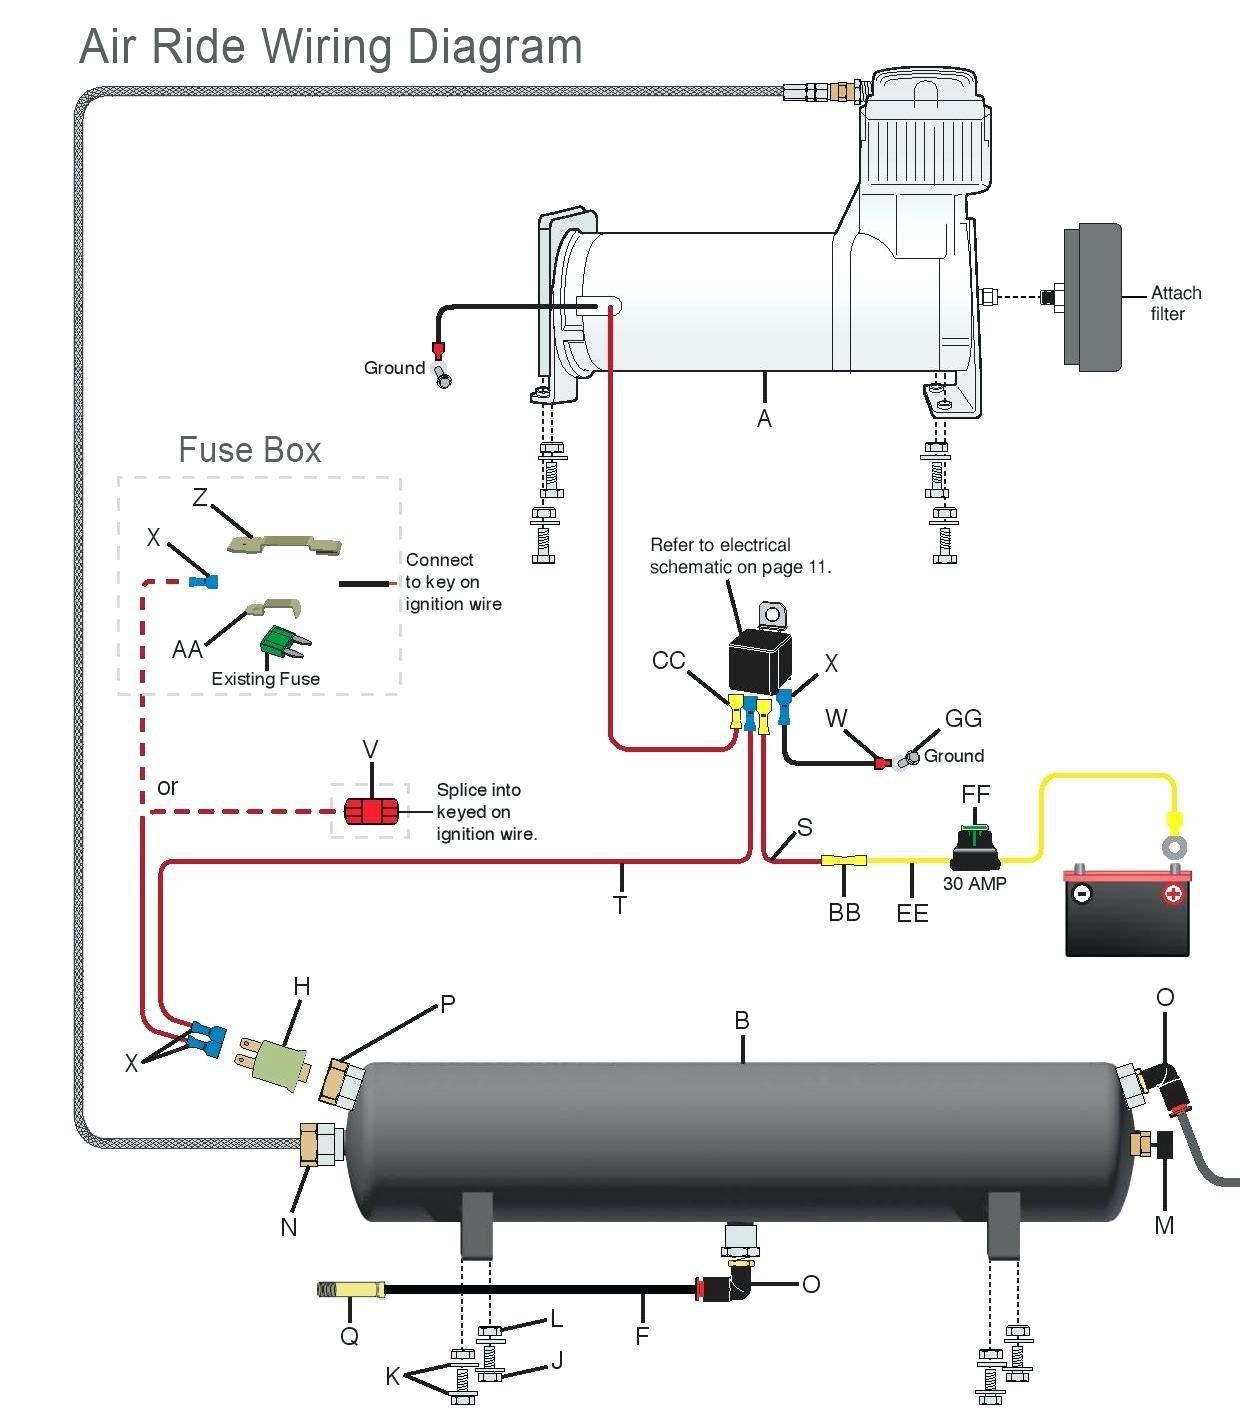 R33 Ignition Wiring Diagram Pdf Air Compressor Image